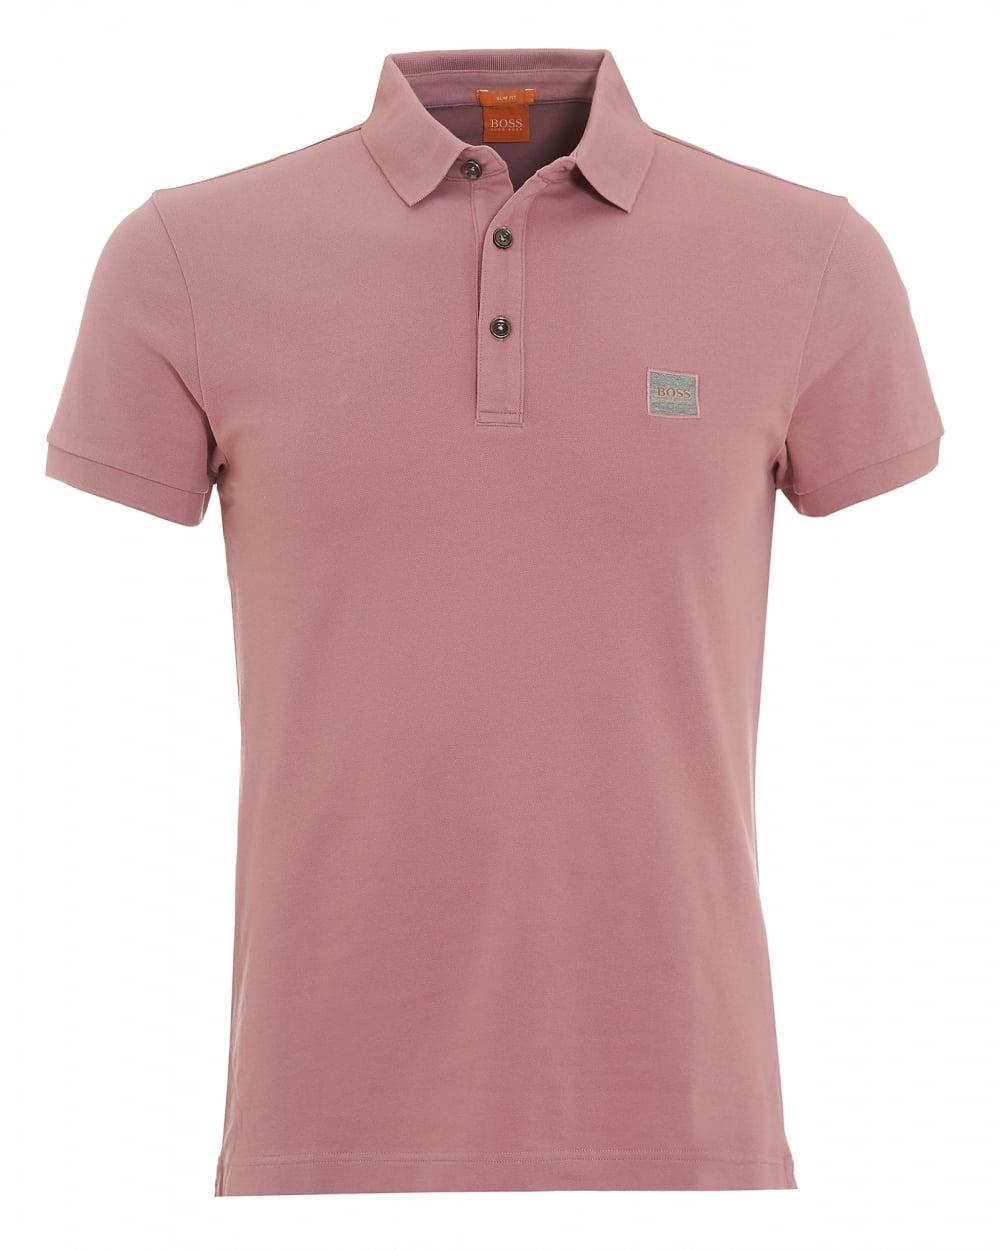 Mens Pavlik Polo, Plain Chest Logo Pink Polo Shirt